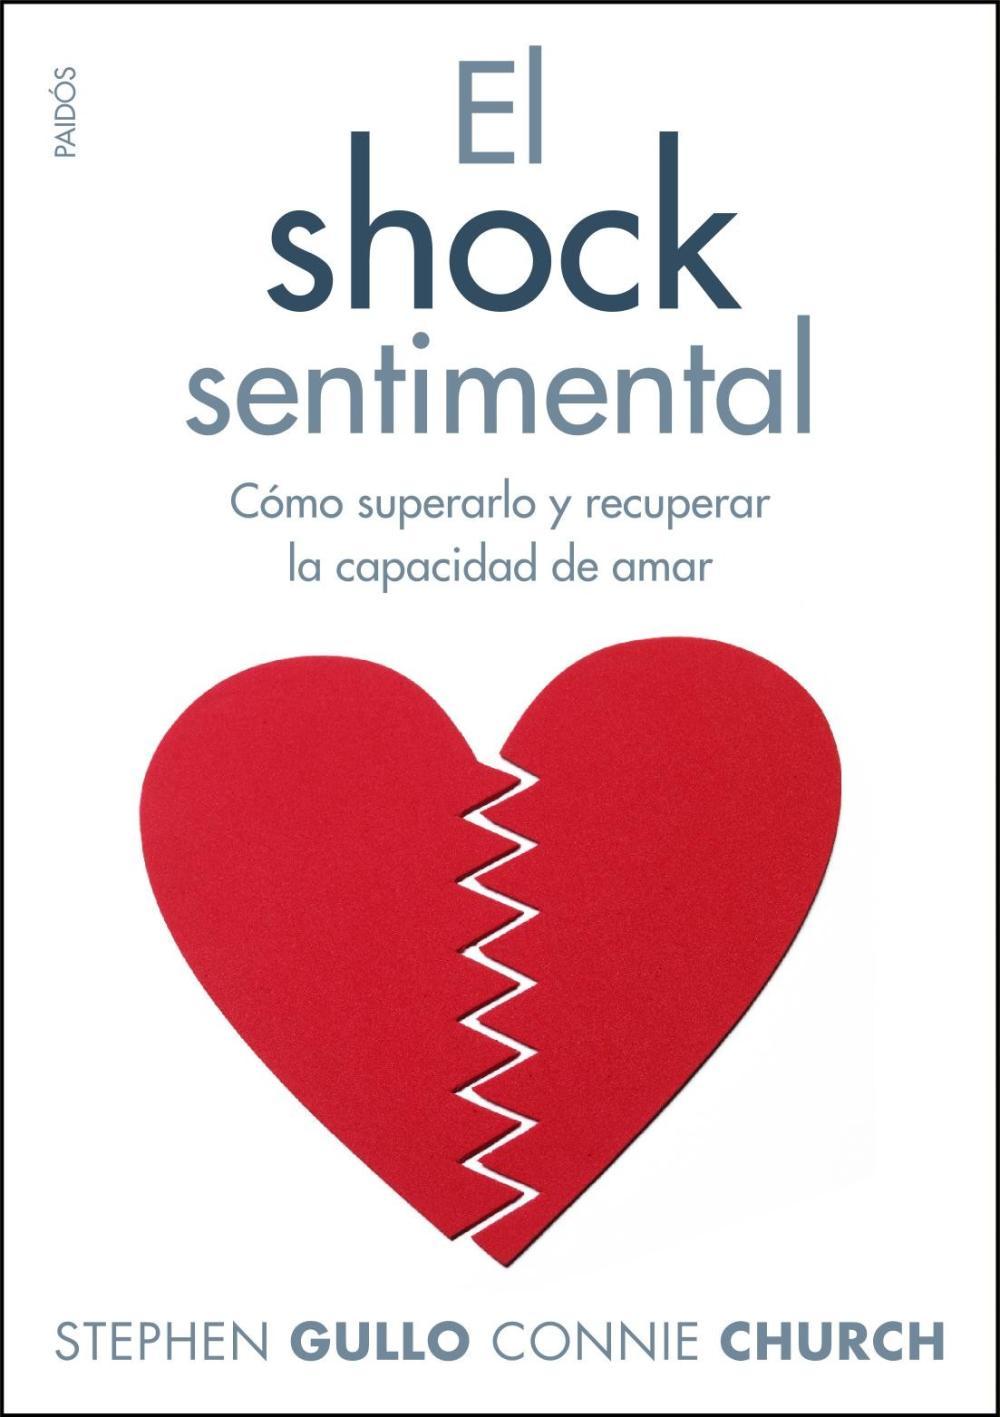 El shock sentimental